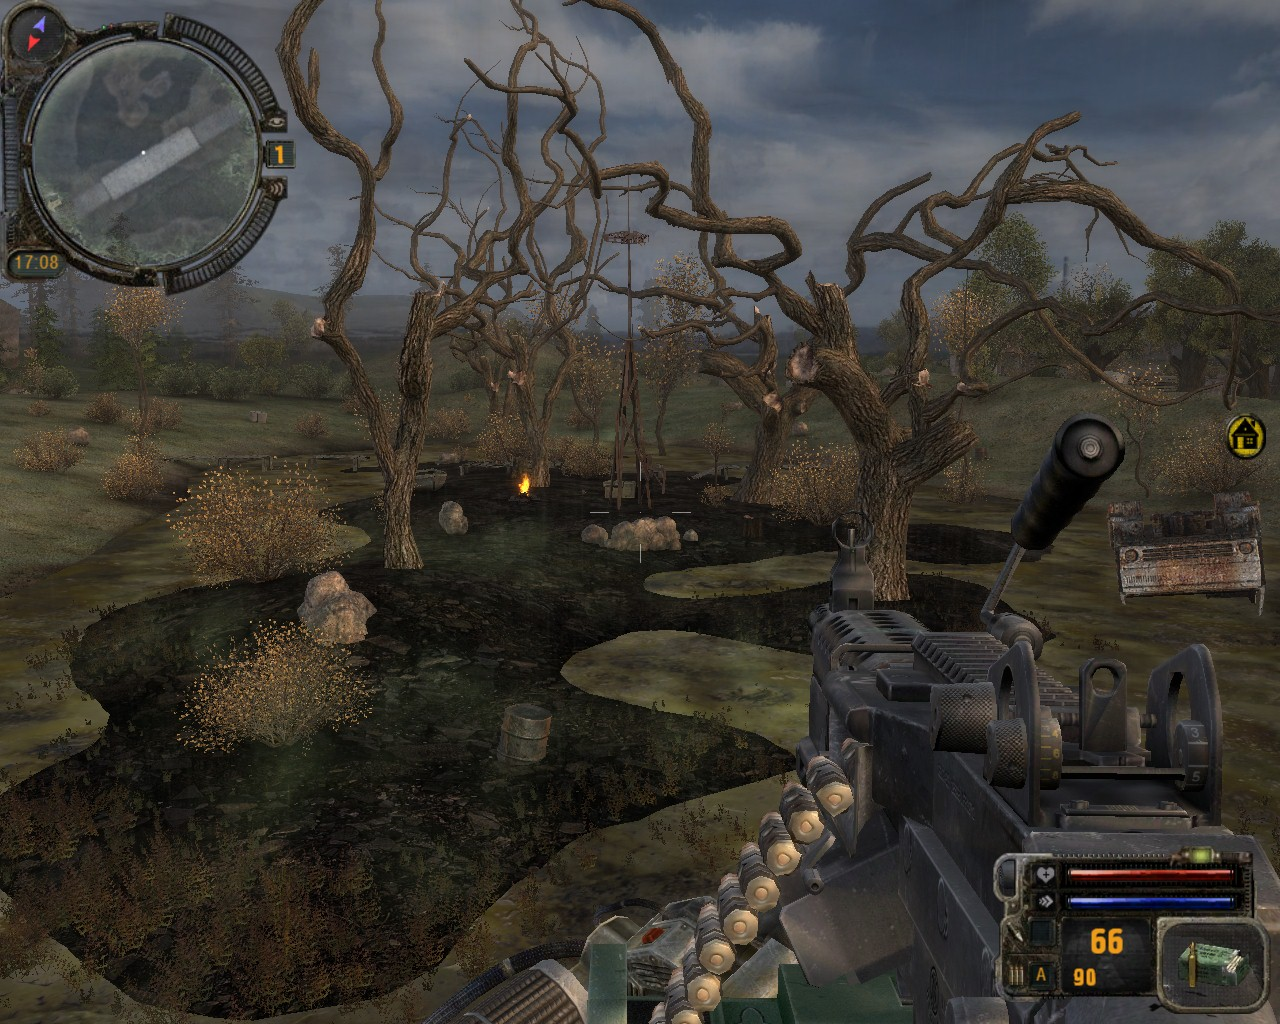 Скриншот S.T.A.L.K.E.R.: Снайпер 2 (2016) PC